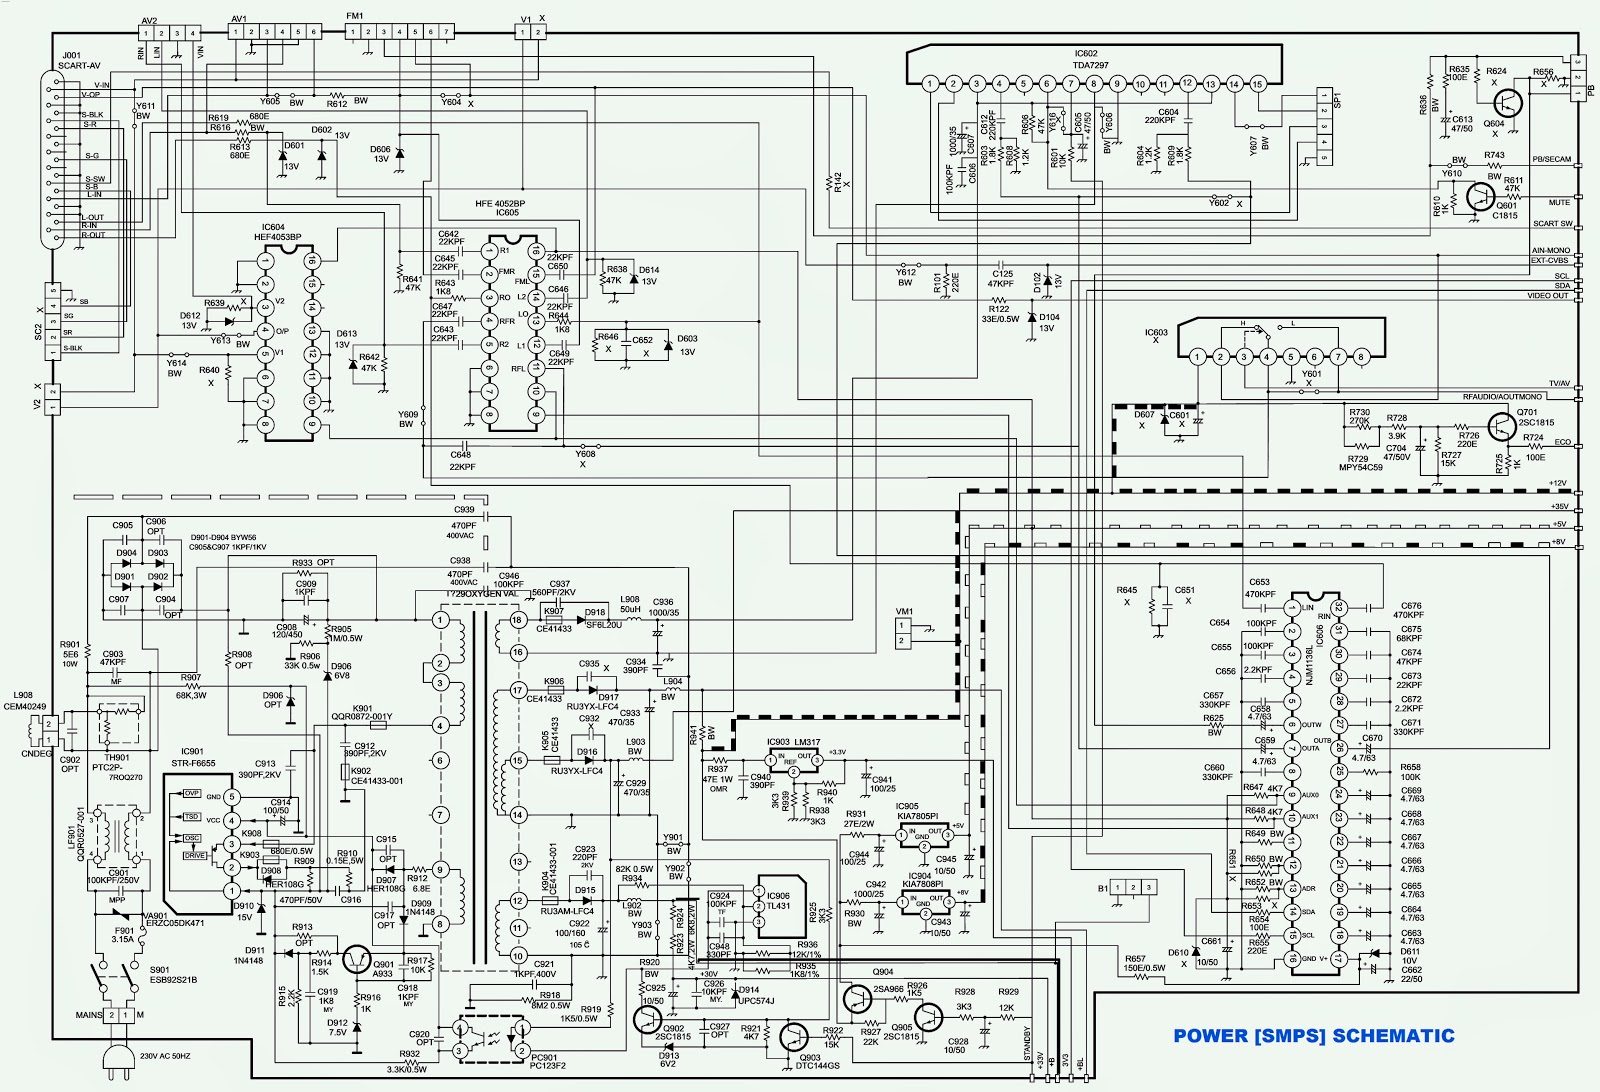 Lg Tv Schematic Diagrams Wiring Diagram Libraries Lcd Http Wwwseekiccom Circuitdiagram Control Simple Schemalg Hitachi Of